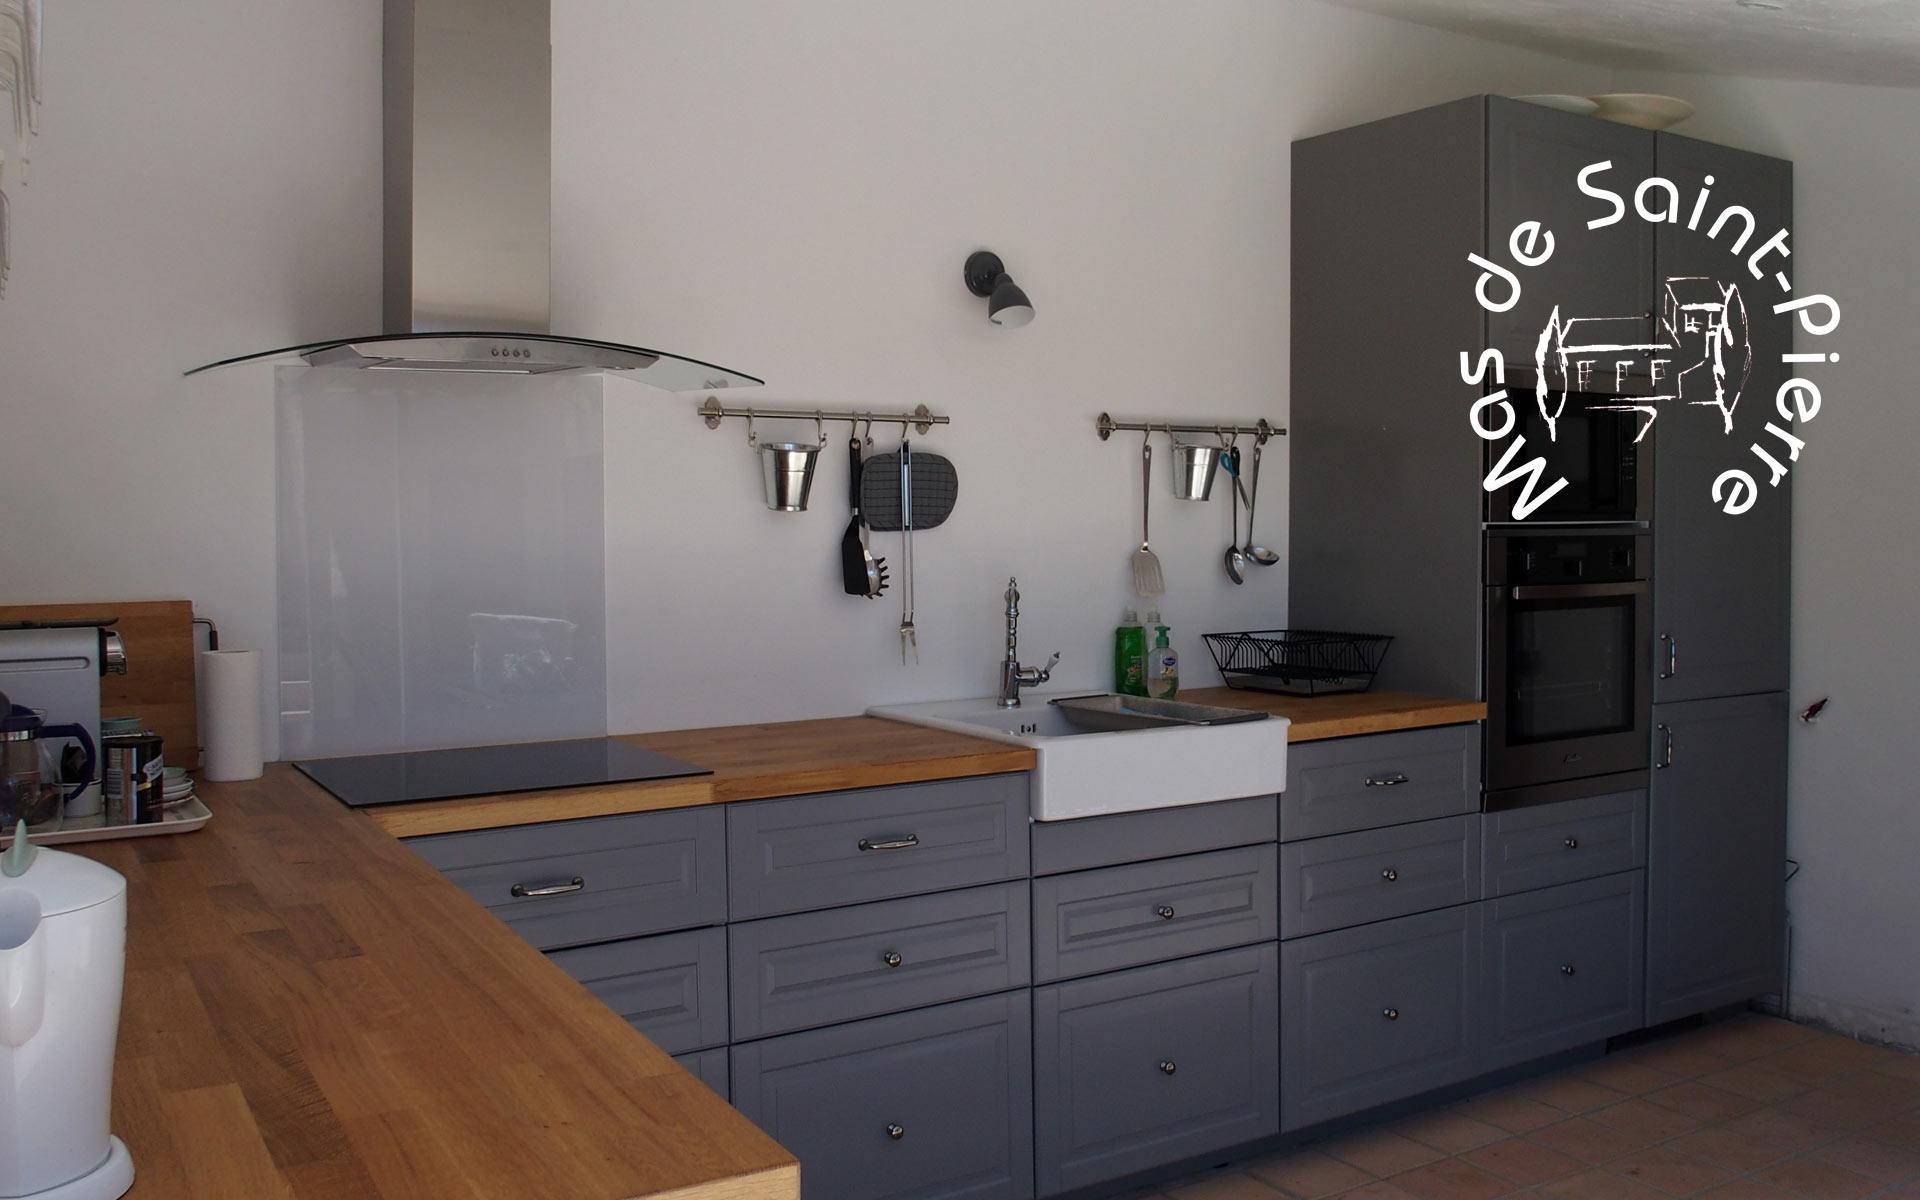 La cuisine – die Küche